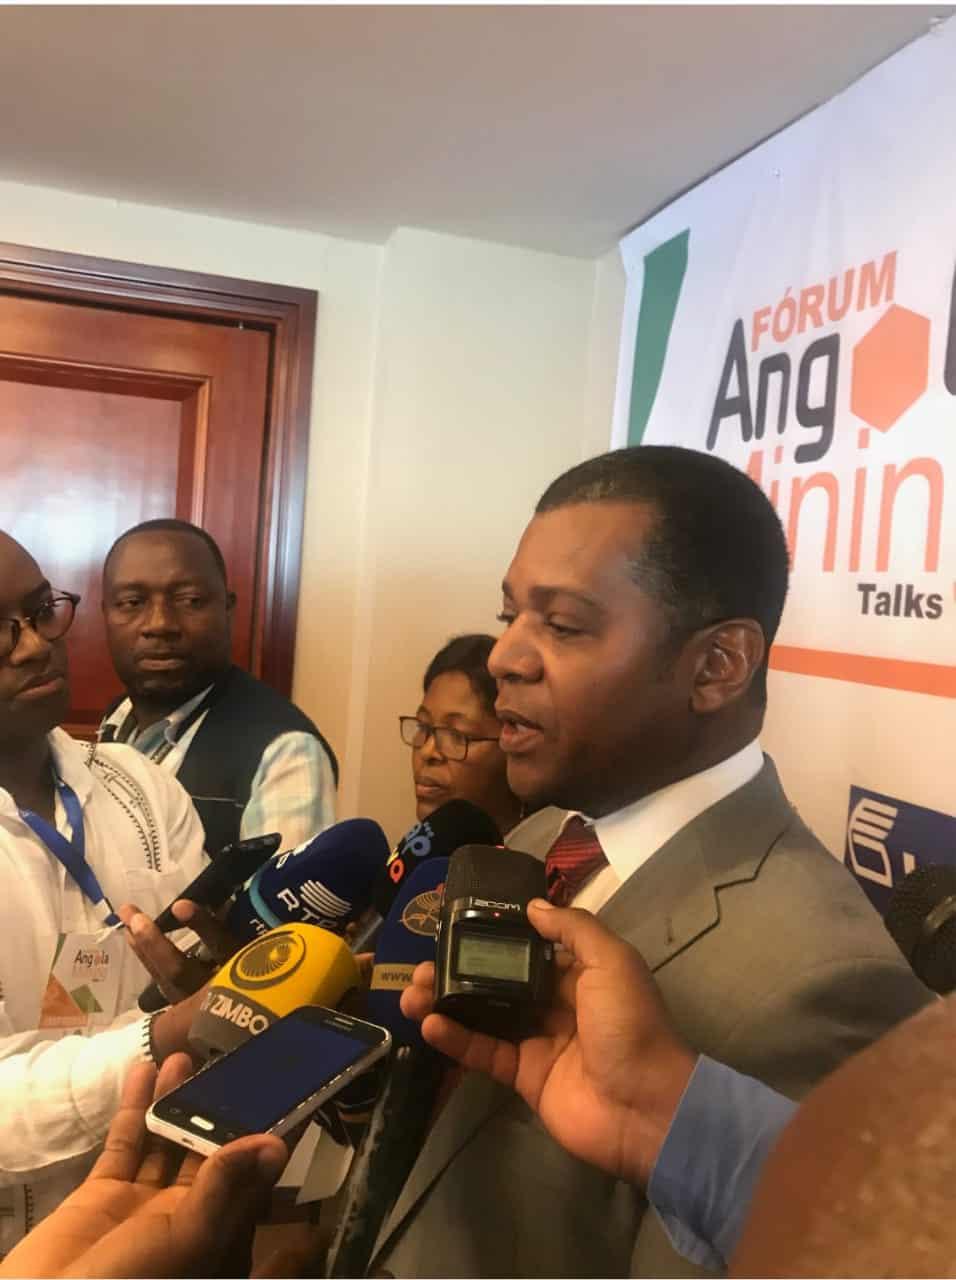 Forum Angola Mining Talks 2019